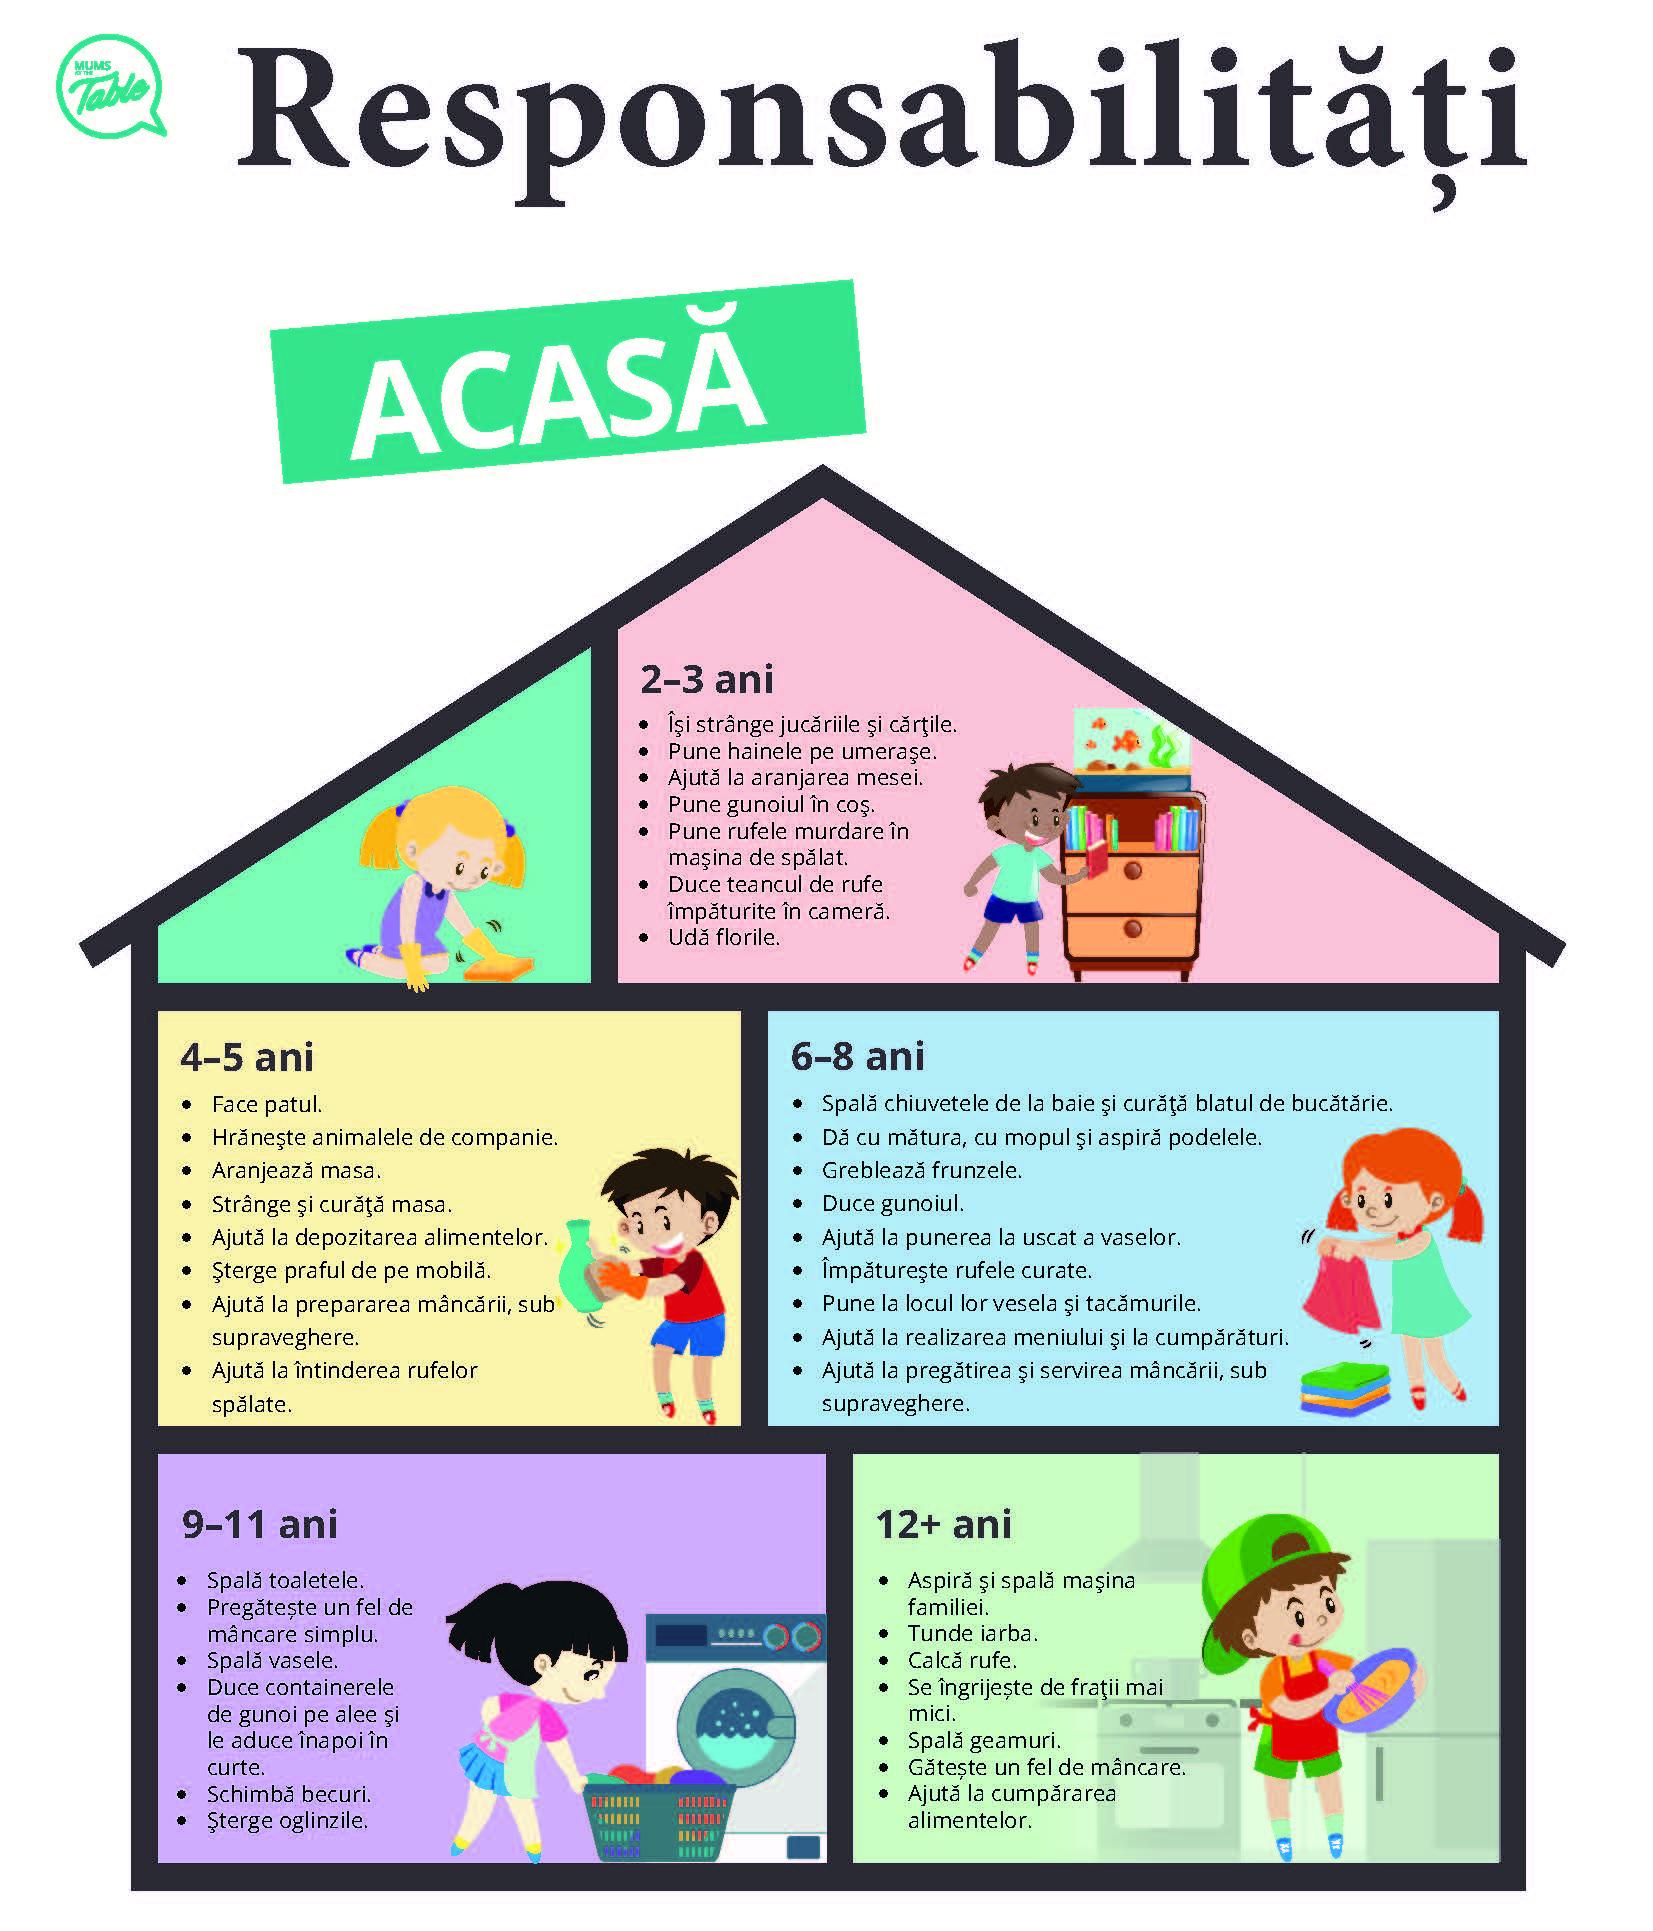 Ce responsabilitati trebuie sa aiba copilul in functie de varsta